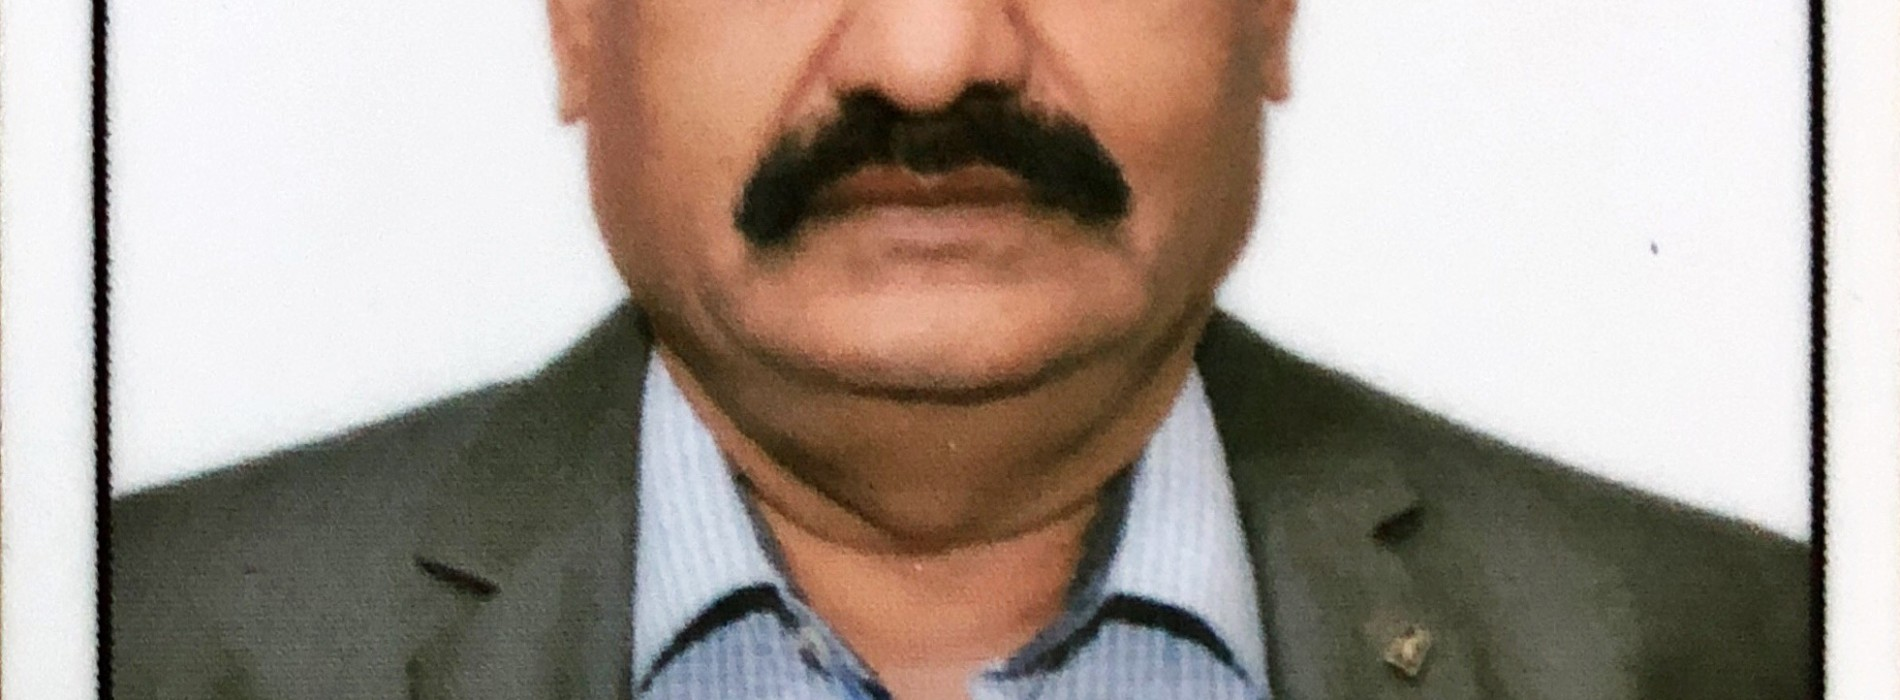 Ramu B. IAS is the new Director of Karnataka Tourism